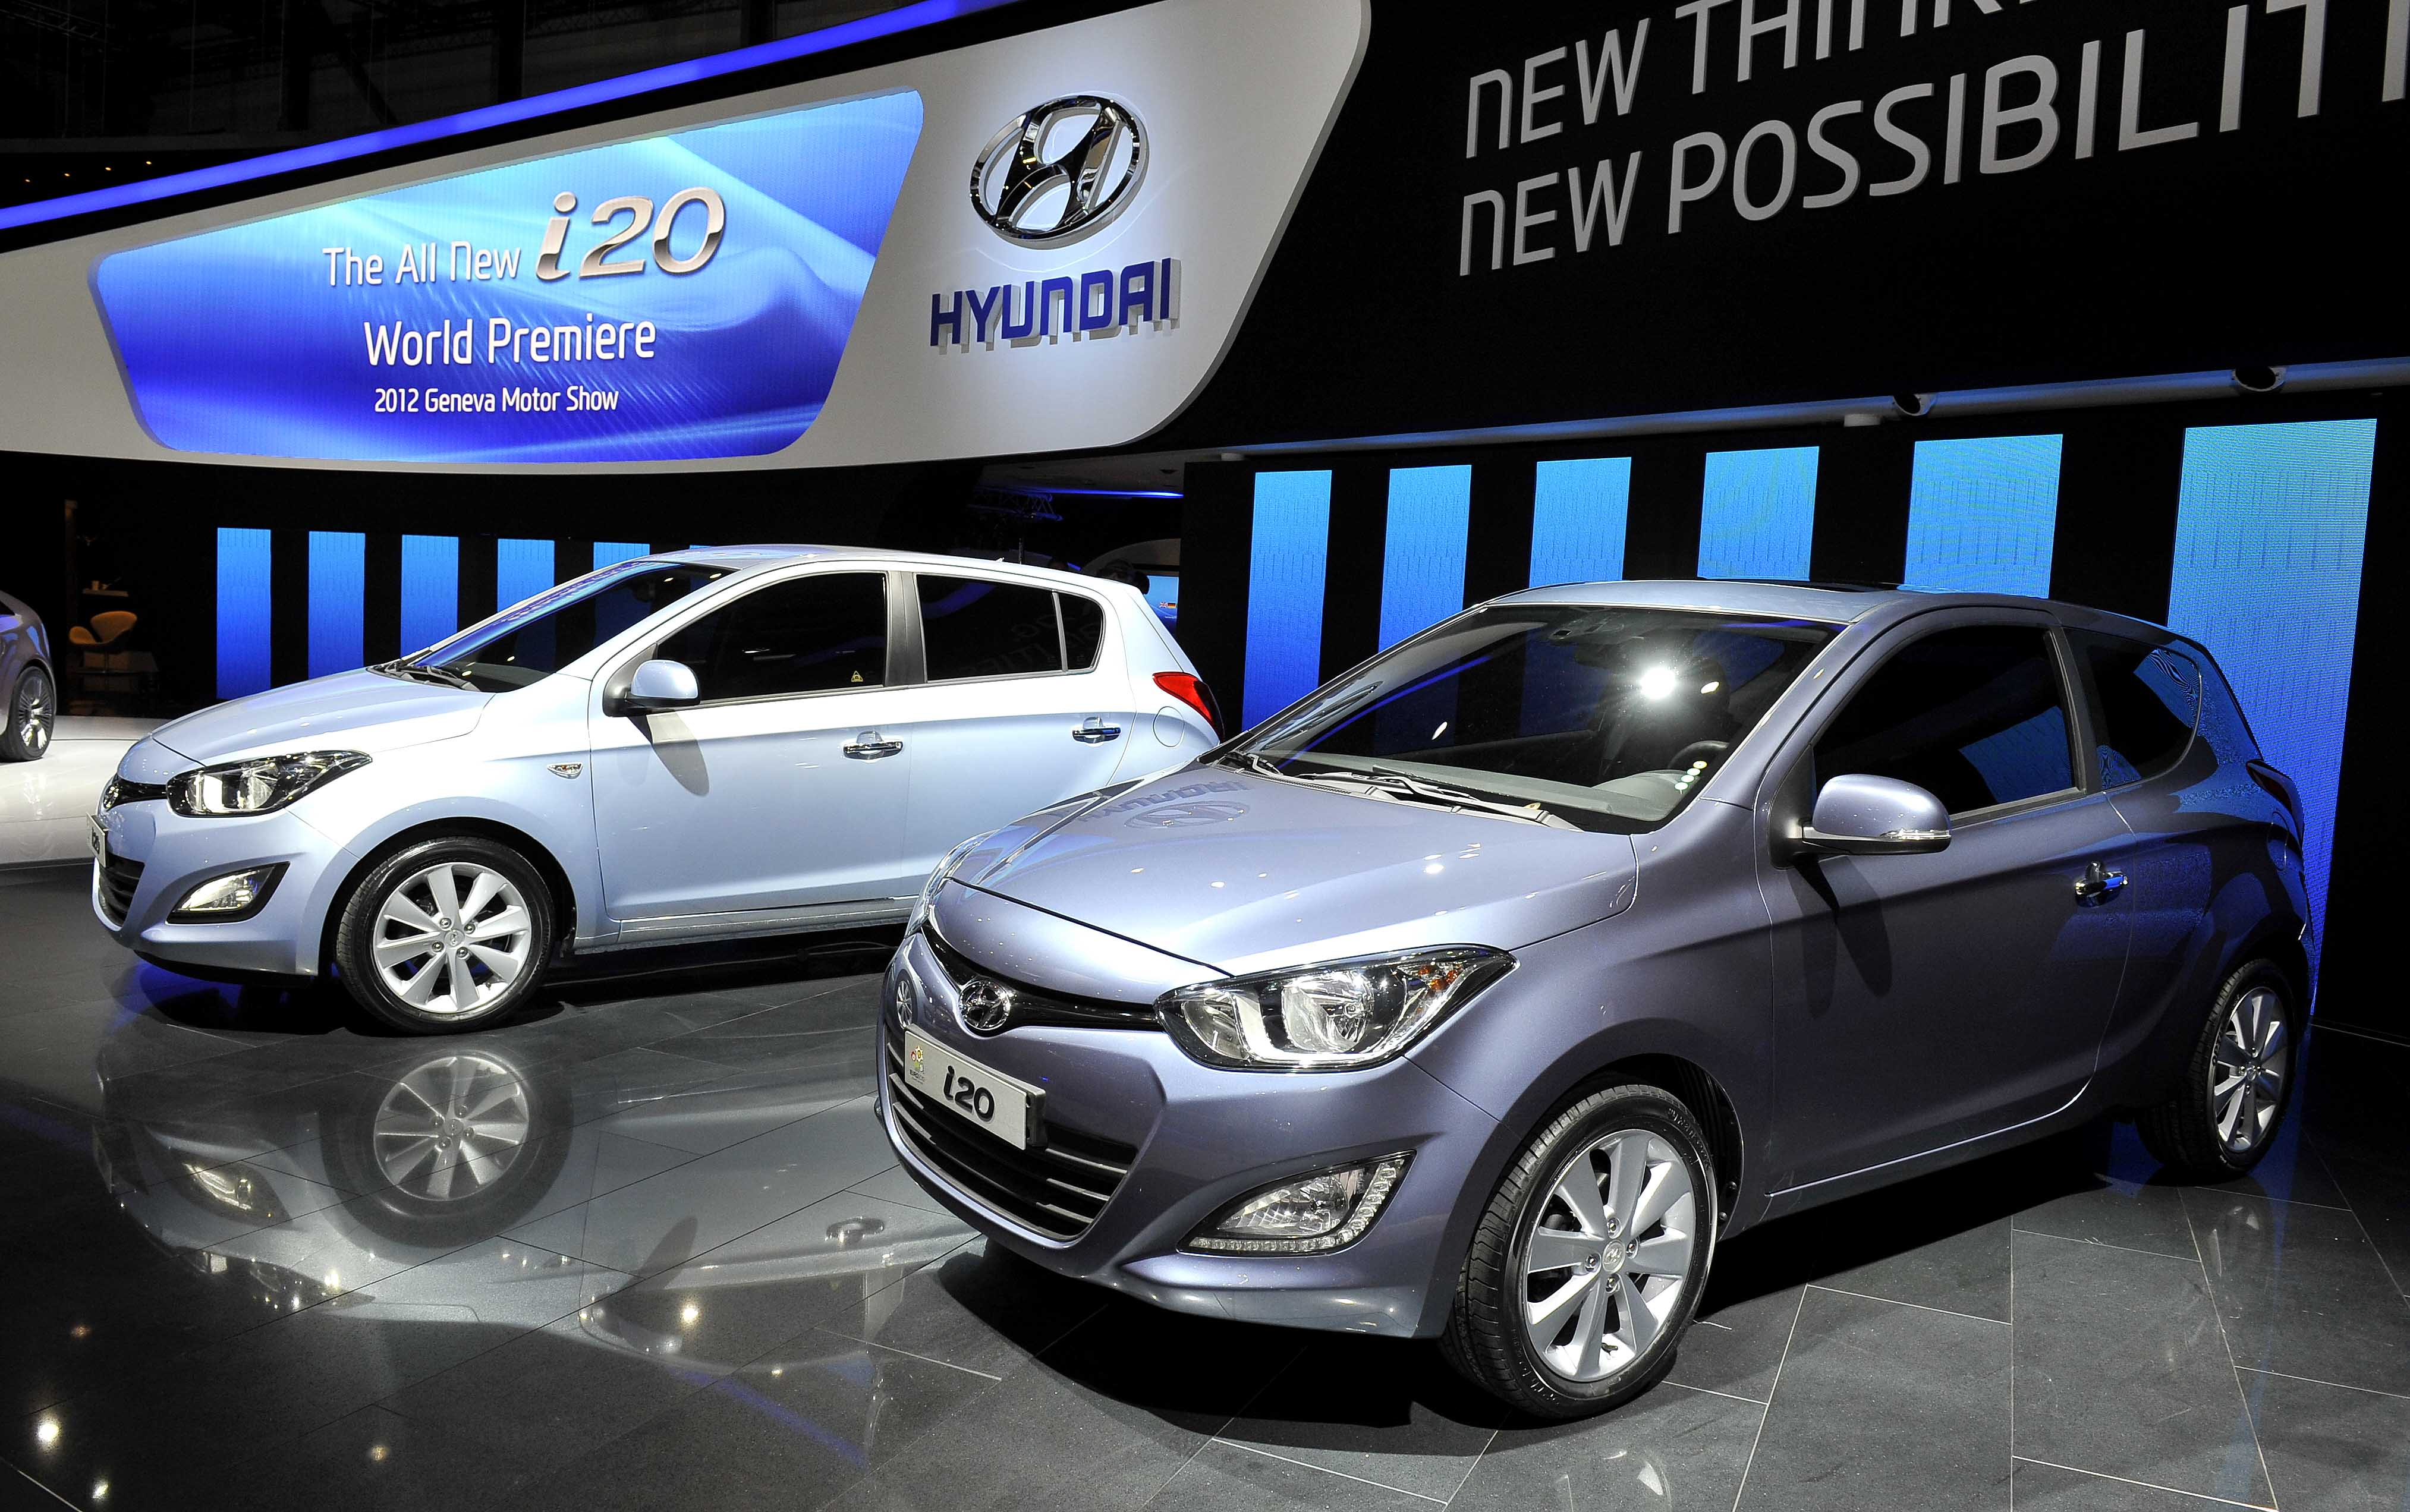 2012 geneva motor show hyundai booth all new i20 1 for Hyundai motor company usa